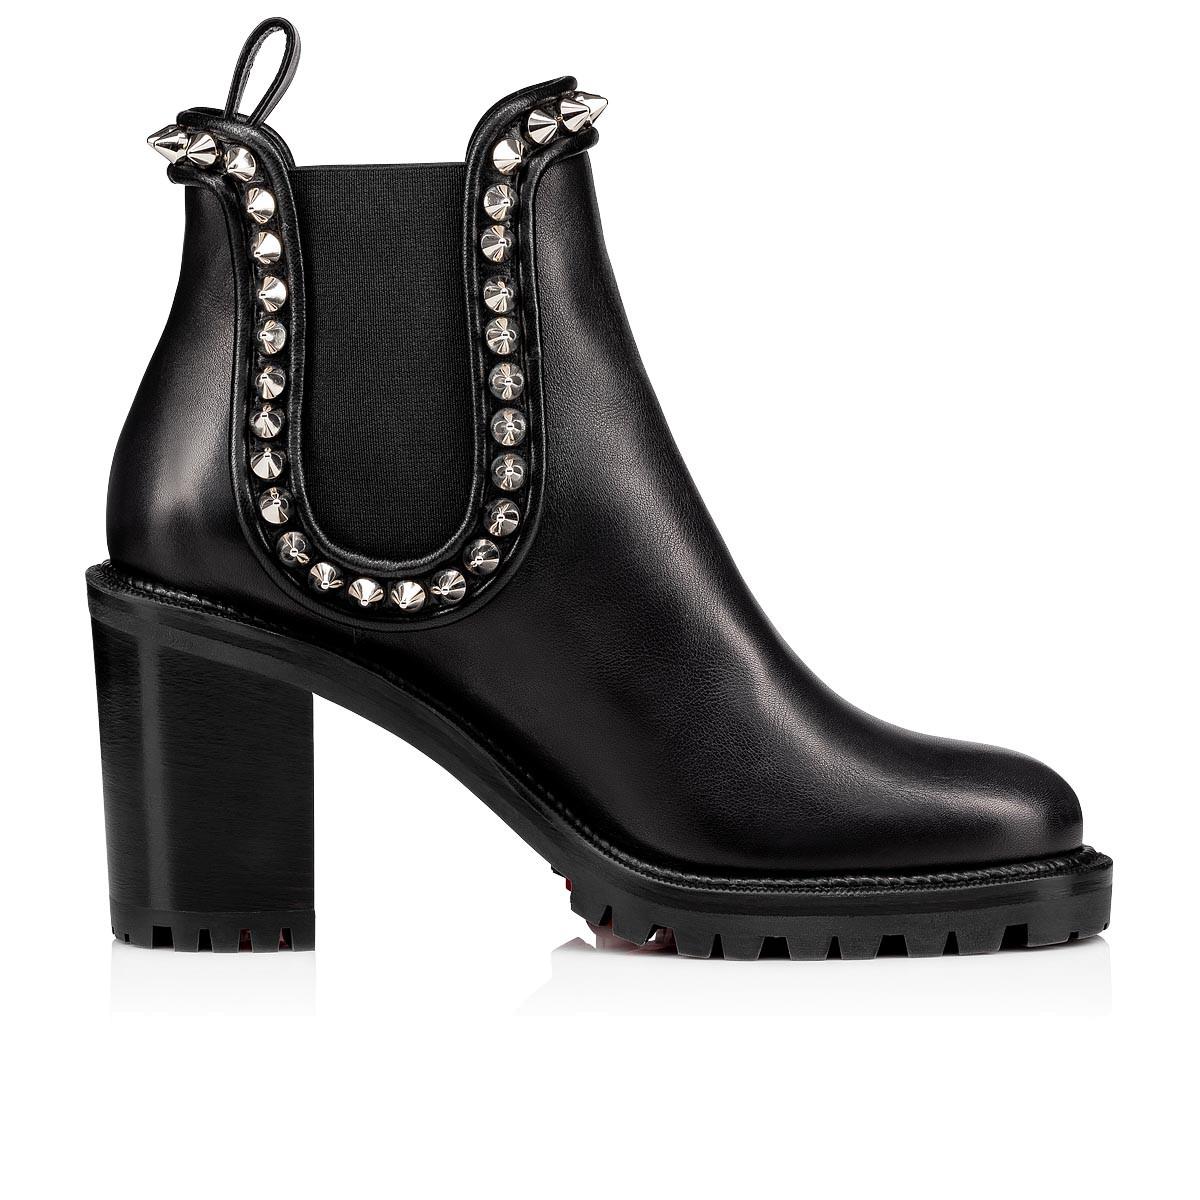 Shoes - Capahutta - Christian Louboutin